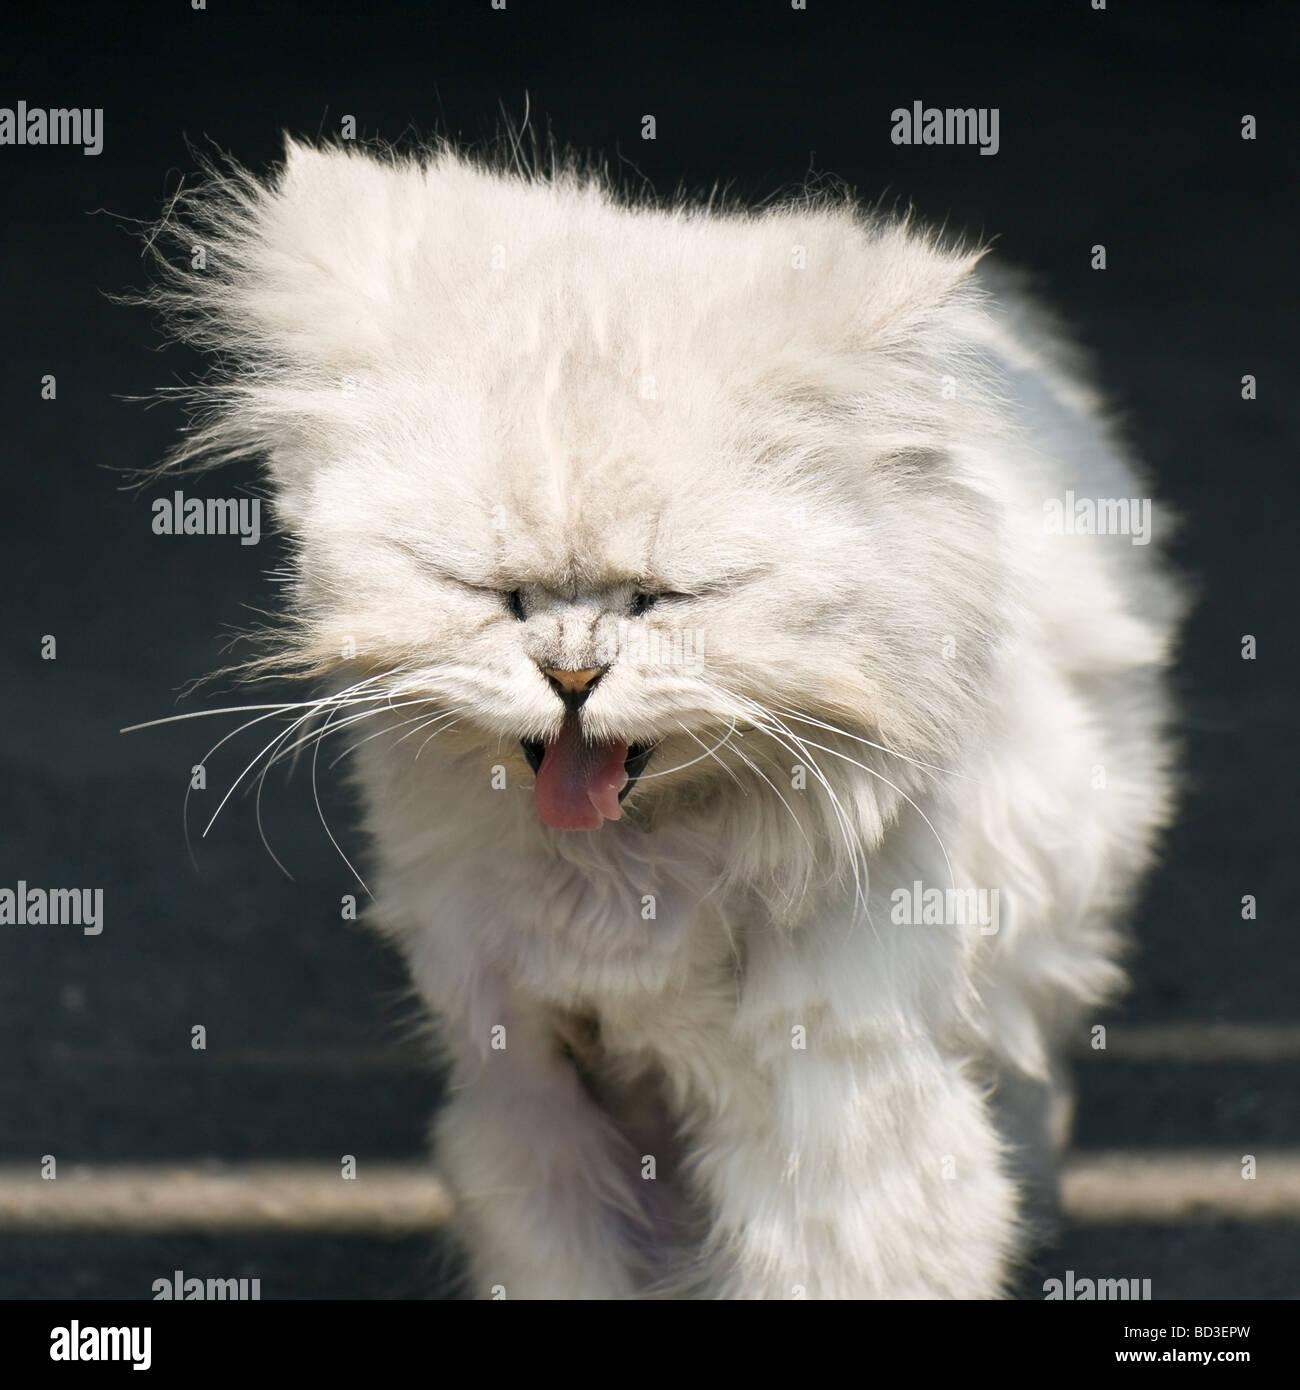 a siberian white cute cat yawning - Stock Image